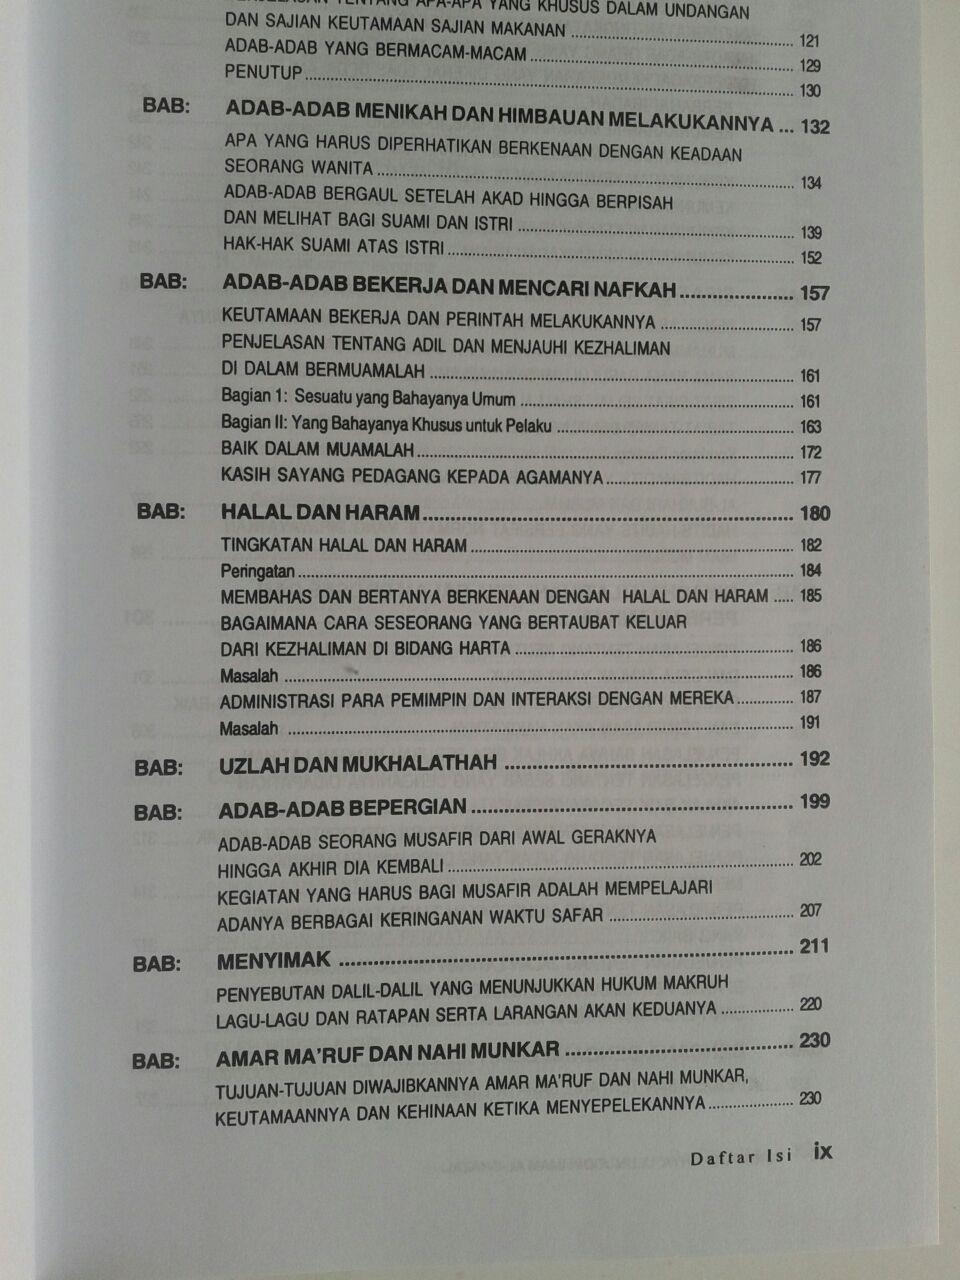 Buku Putih Ihya Ulumuddin Imam Ghazali isi 2